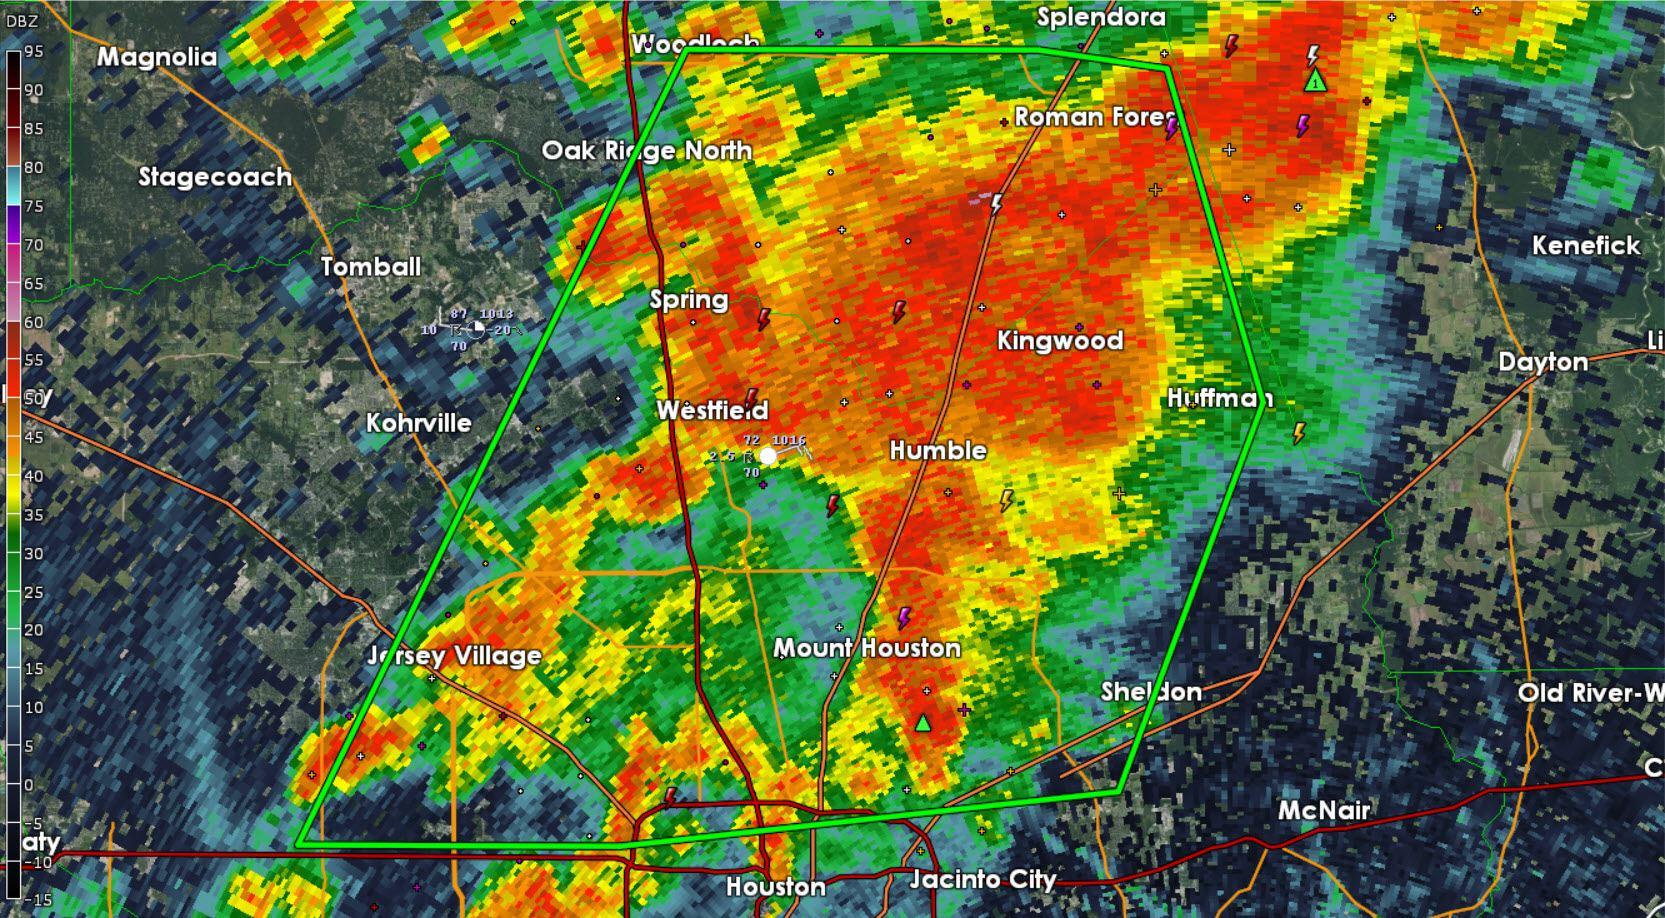 Flash Flood Warning: Harris, Montgomery Counties until 6:30 PM ...